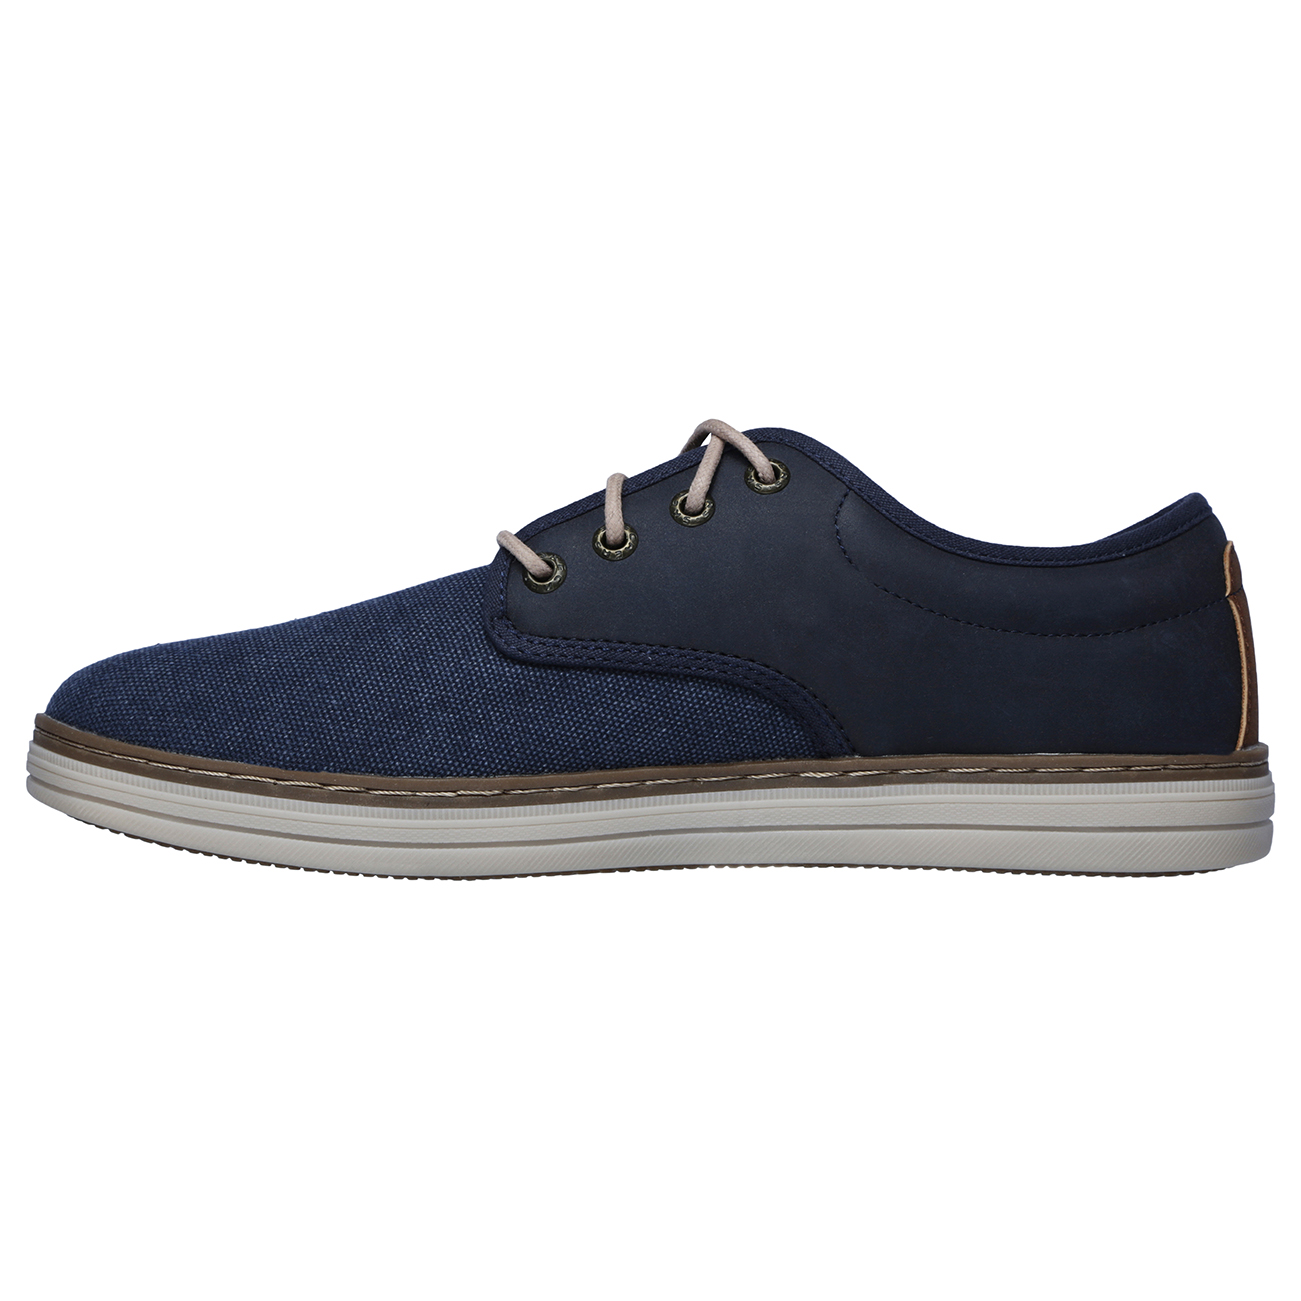 better authentic half price Details about Mens Skechers Heston Santano Memory Foam Smart Canvas Work  Casual Shoes US 8-14